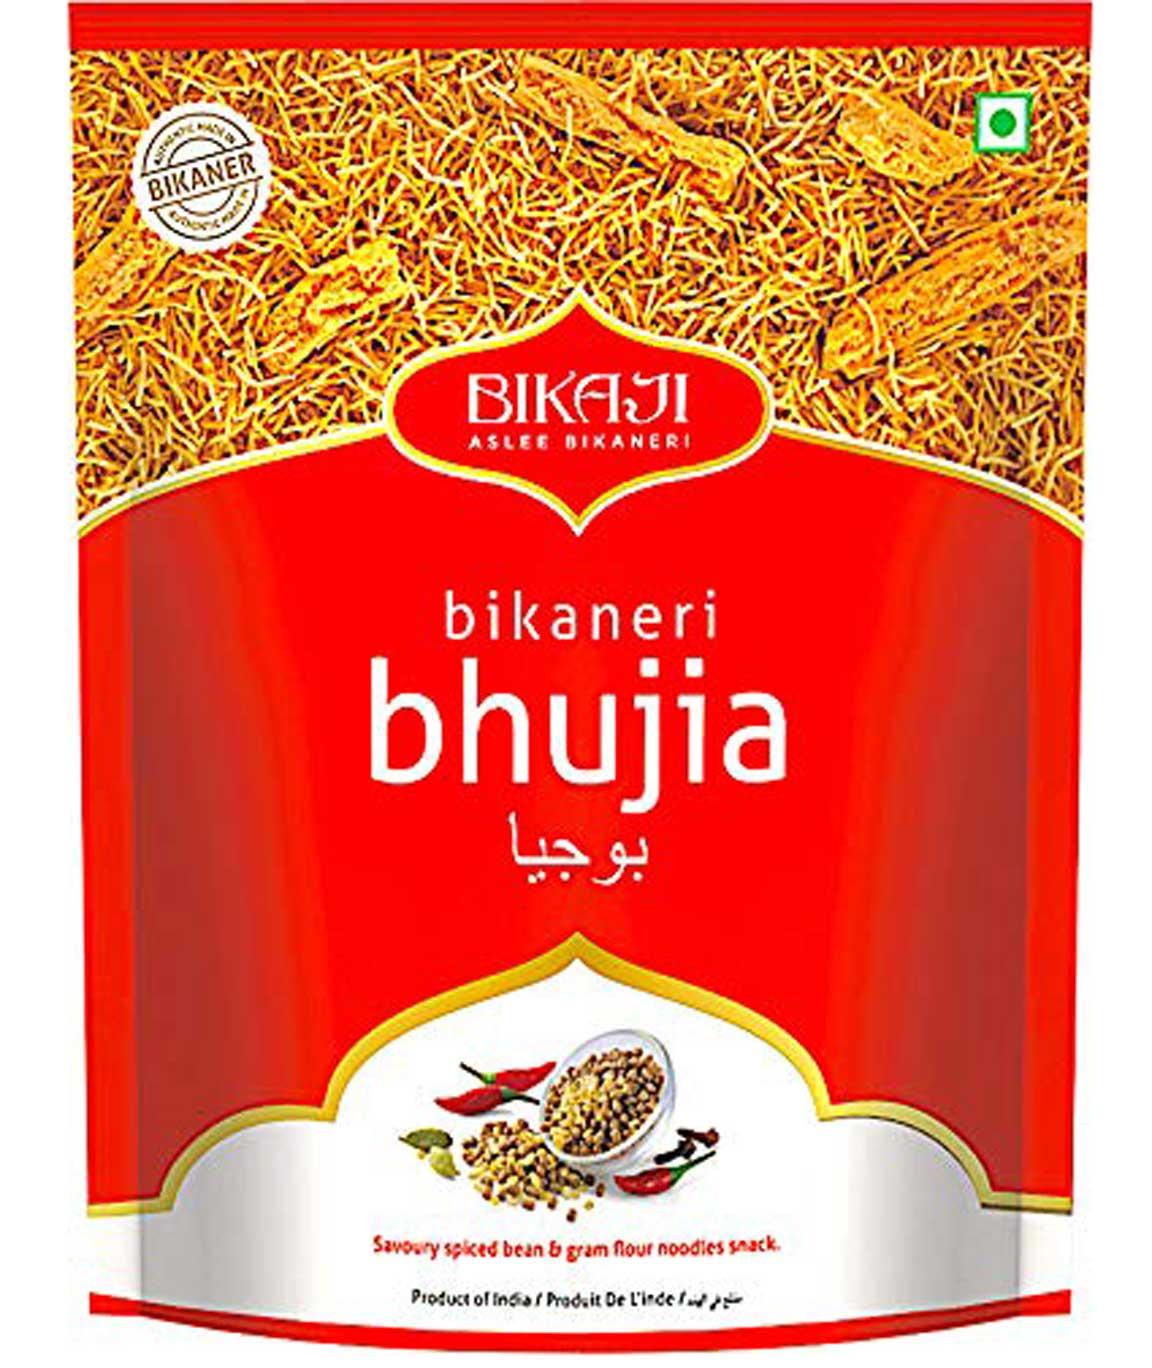 Bikaji Aslee Bikaneri Vegetarian Indian Namkeen Snack, 1 kg